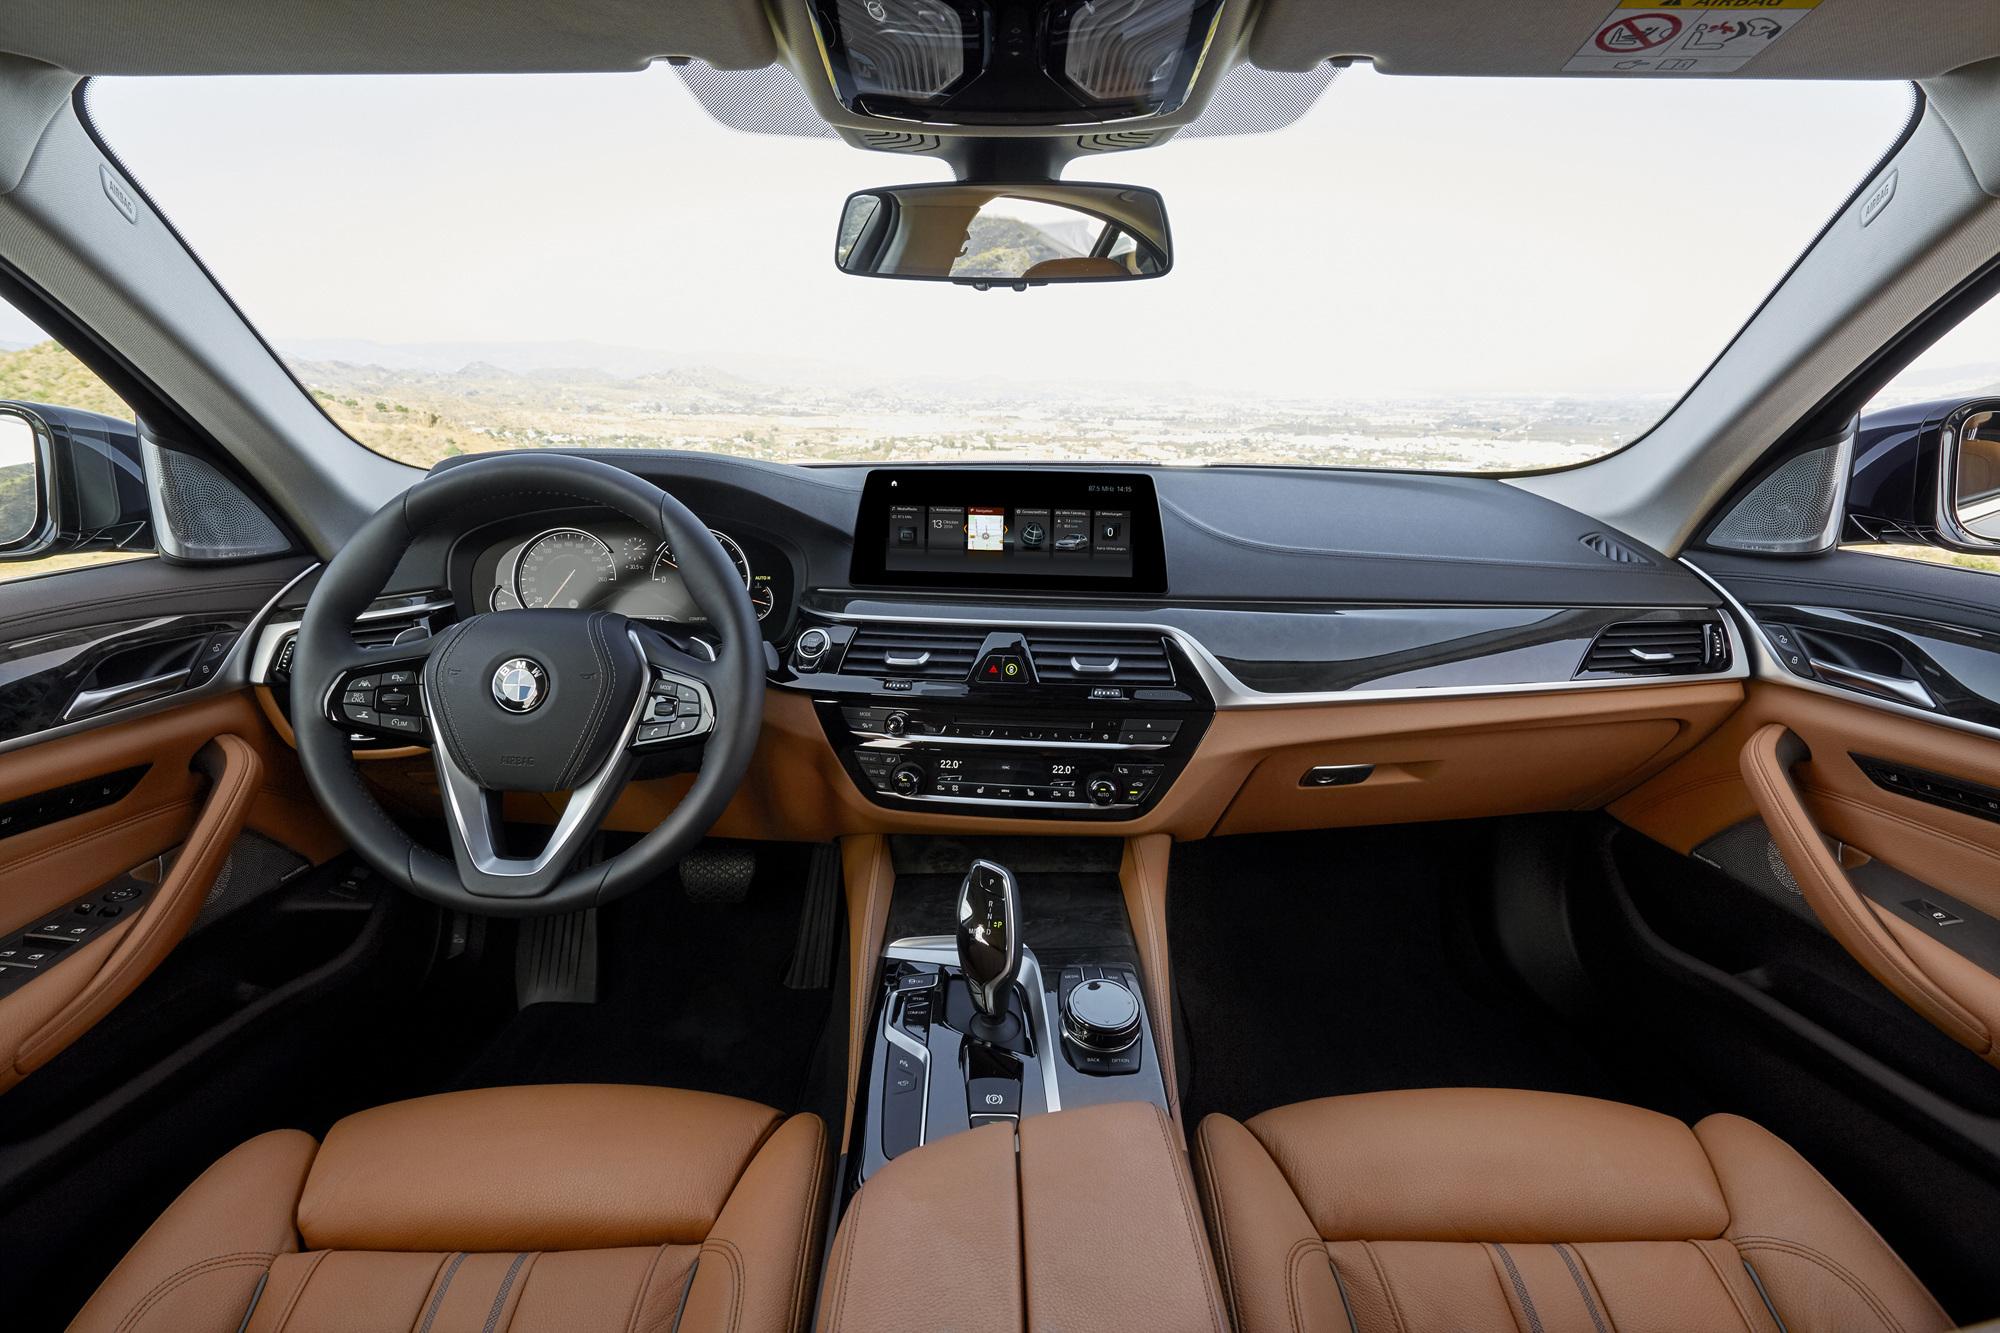 BMW '뉴 520d 럭셔리 스페셜 에디션'   (서울=연합뉴스) BMW 그룹 코리아가 베스트셀링 프리미엄 비즈니스 세단 뉴 5시리즈에 고급스러움을 강조한 '뉴 520d 럭셔리 스페셜 에디션' 모델을 출시했다고 16일 전했다.   새롭게 출시된 뉴 520d 럭셔리 스페셜 에디션은 기존 M스포츠 패키지와 차별화된 외관 디자인과 새로워진 옵션, 합리적인 가격이 특징이다. 2017.10.16 [BMW 그룹 제공=연합뉴스]   photo@yna.co.kr (끝) <저작권자(c) 연합뉴스, 무단 전재-재배포 금지>